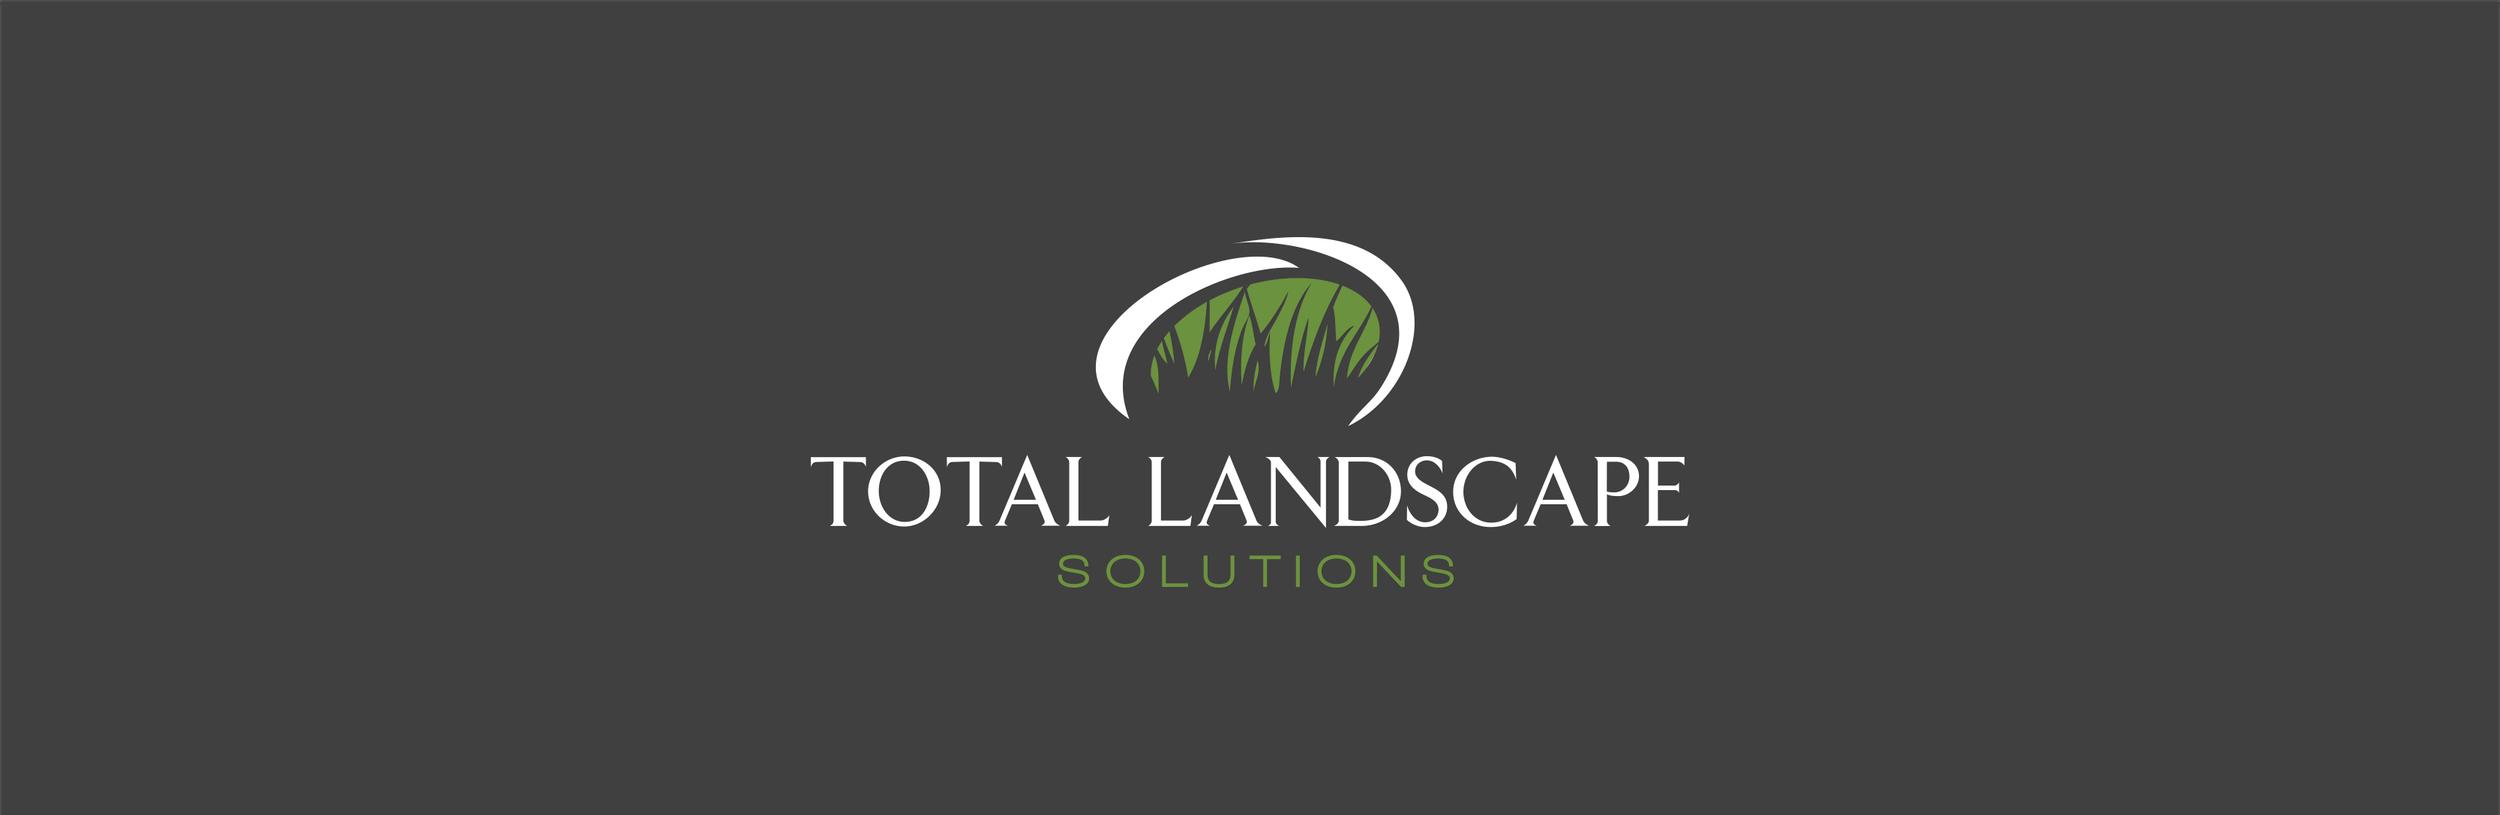 total landscape solutions